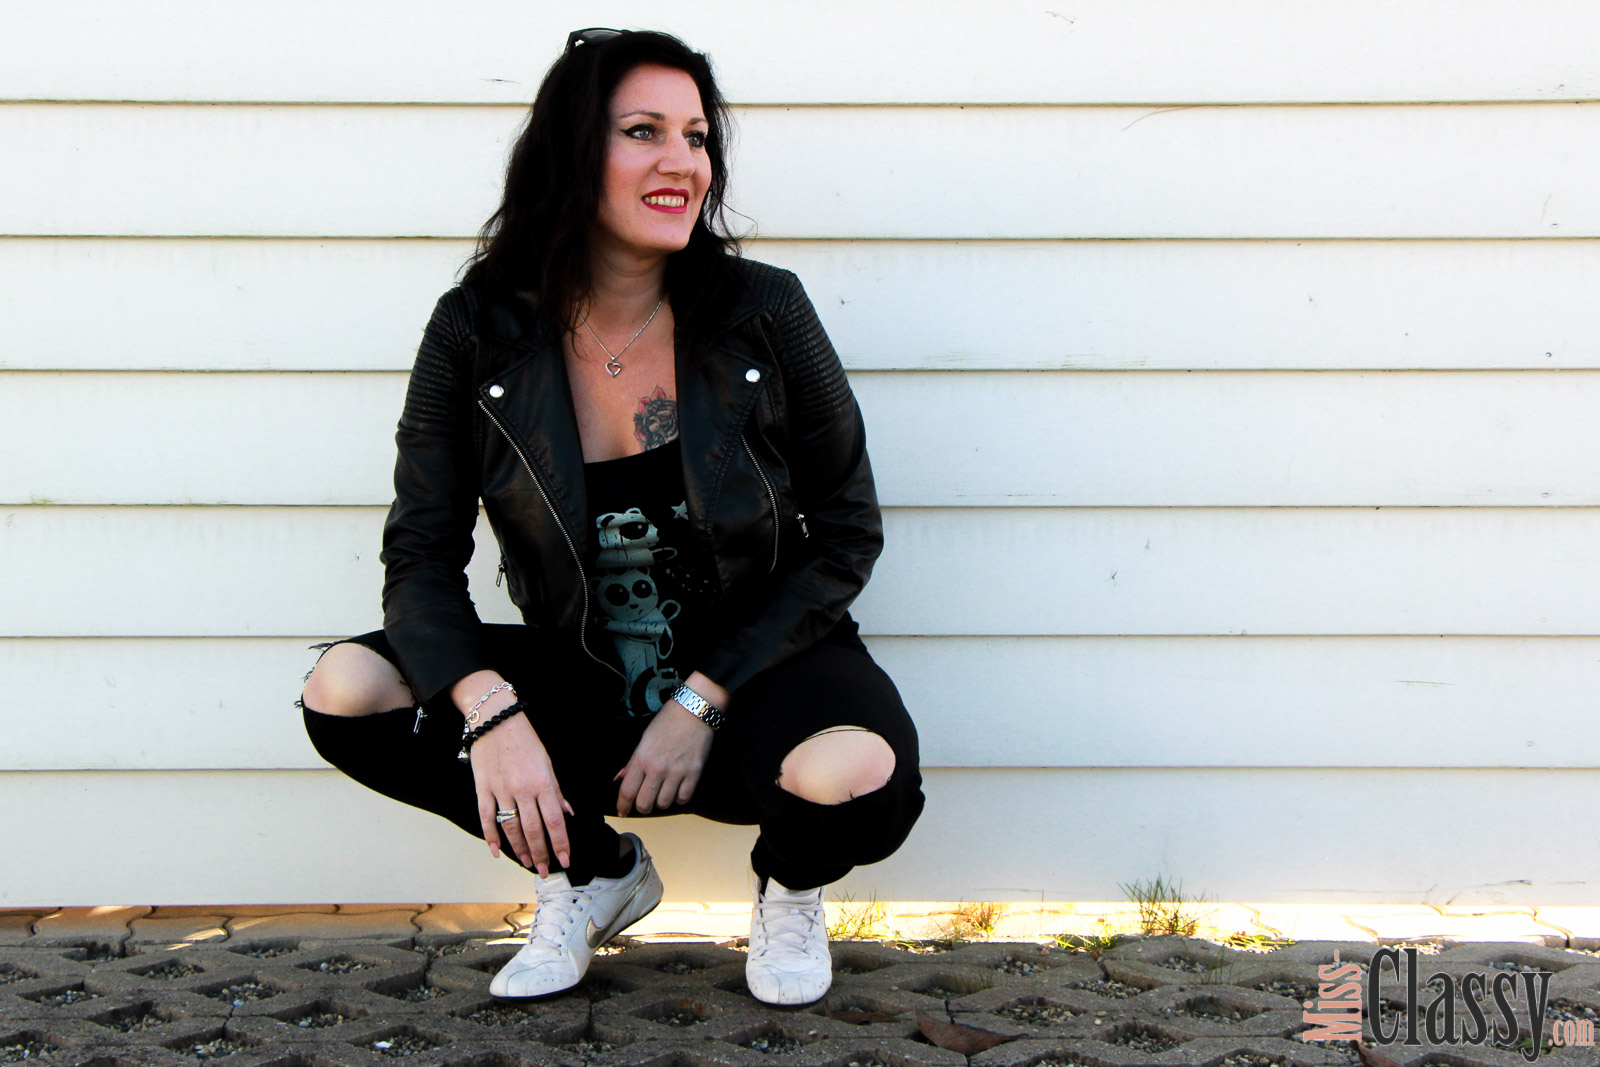 OUTFIT Wenn Kater schwarz, T-Shirt gut, Miss Classy, classy, beclassy, Fashionblog, Fashionblogger, Österreich, Austria, Graz, All Black, Kater Likoli, T-Shirt, Lederjacke, Knee-Cut Jeans, Nike, Sneakers